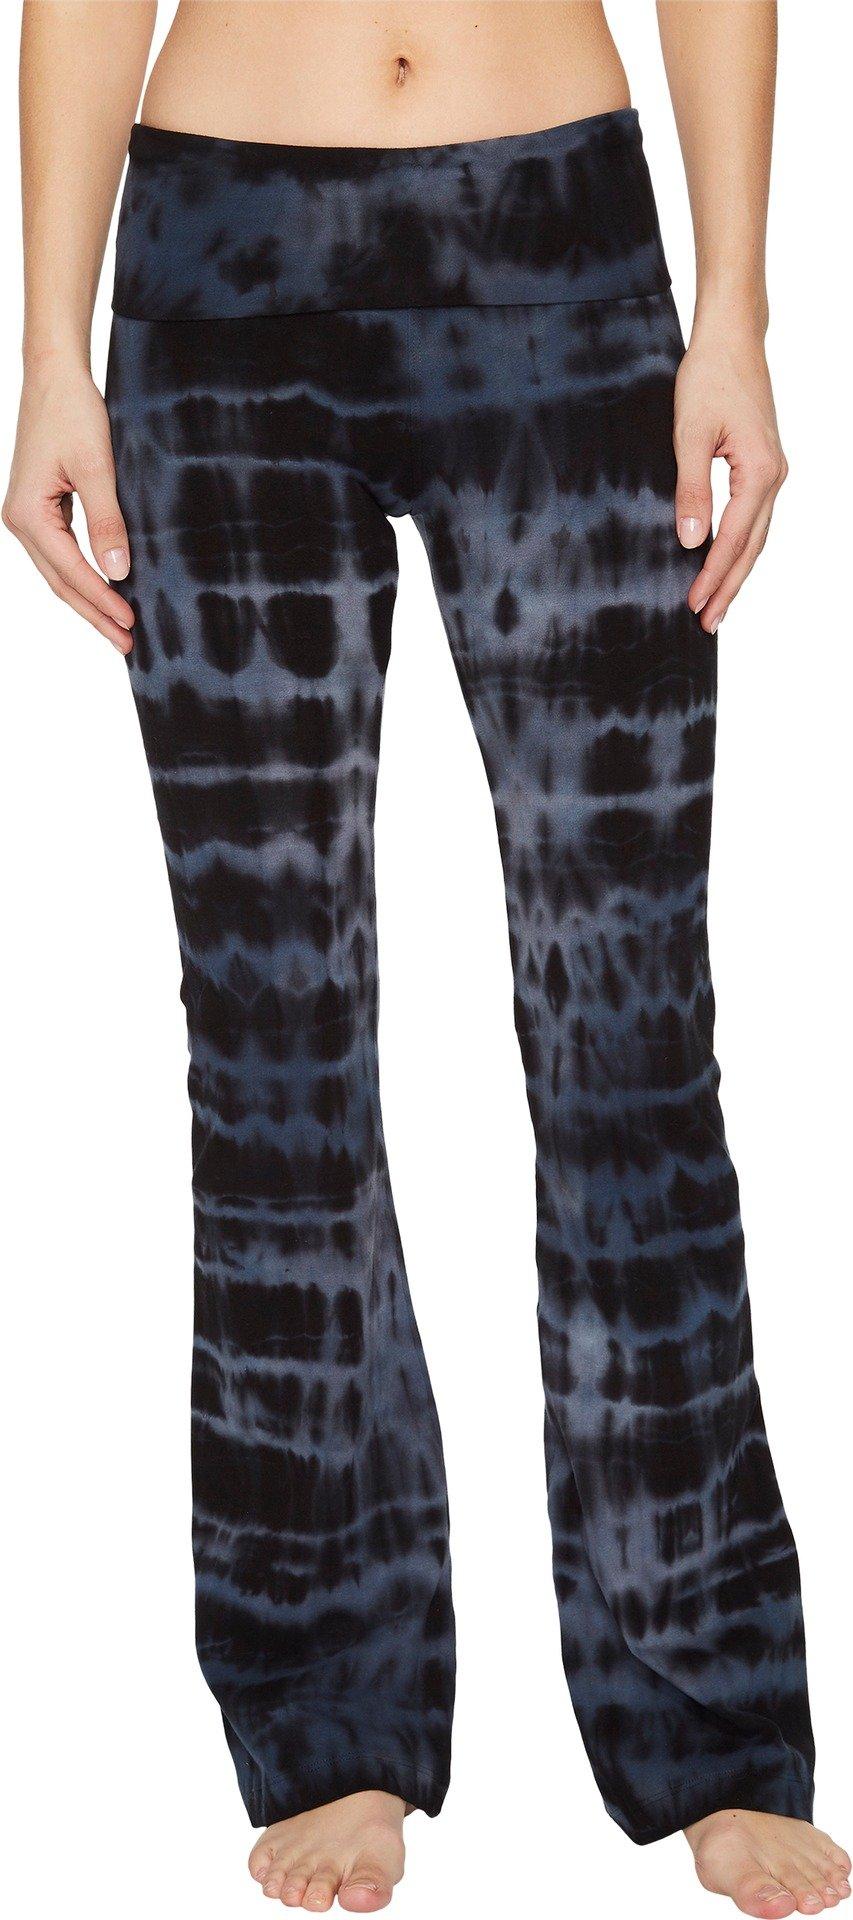 Hard Tail Women's Rolldown Bootleg Flare Pants Cloud Wash 1 Medium